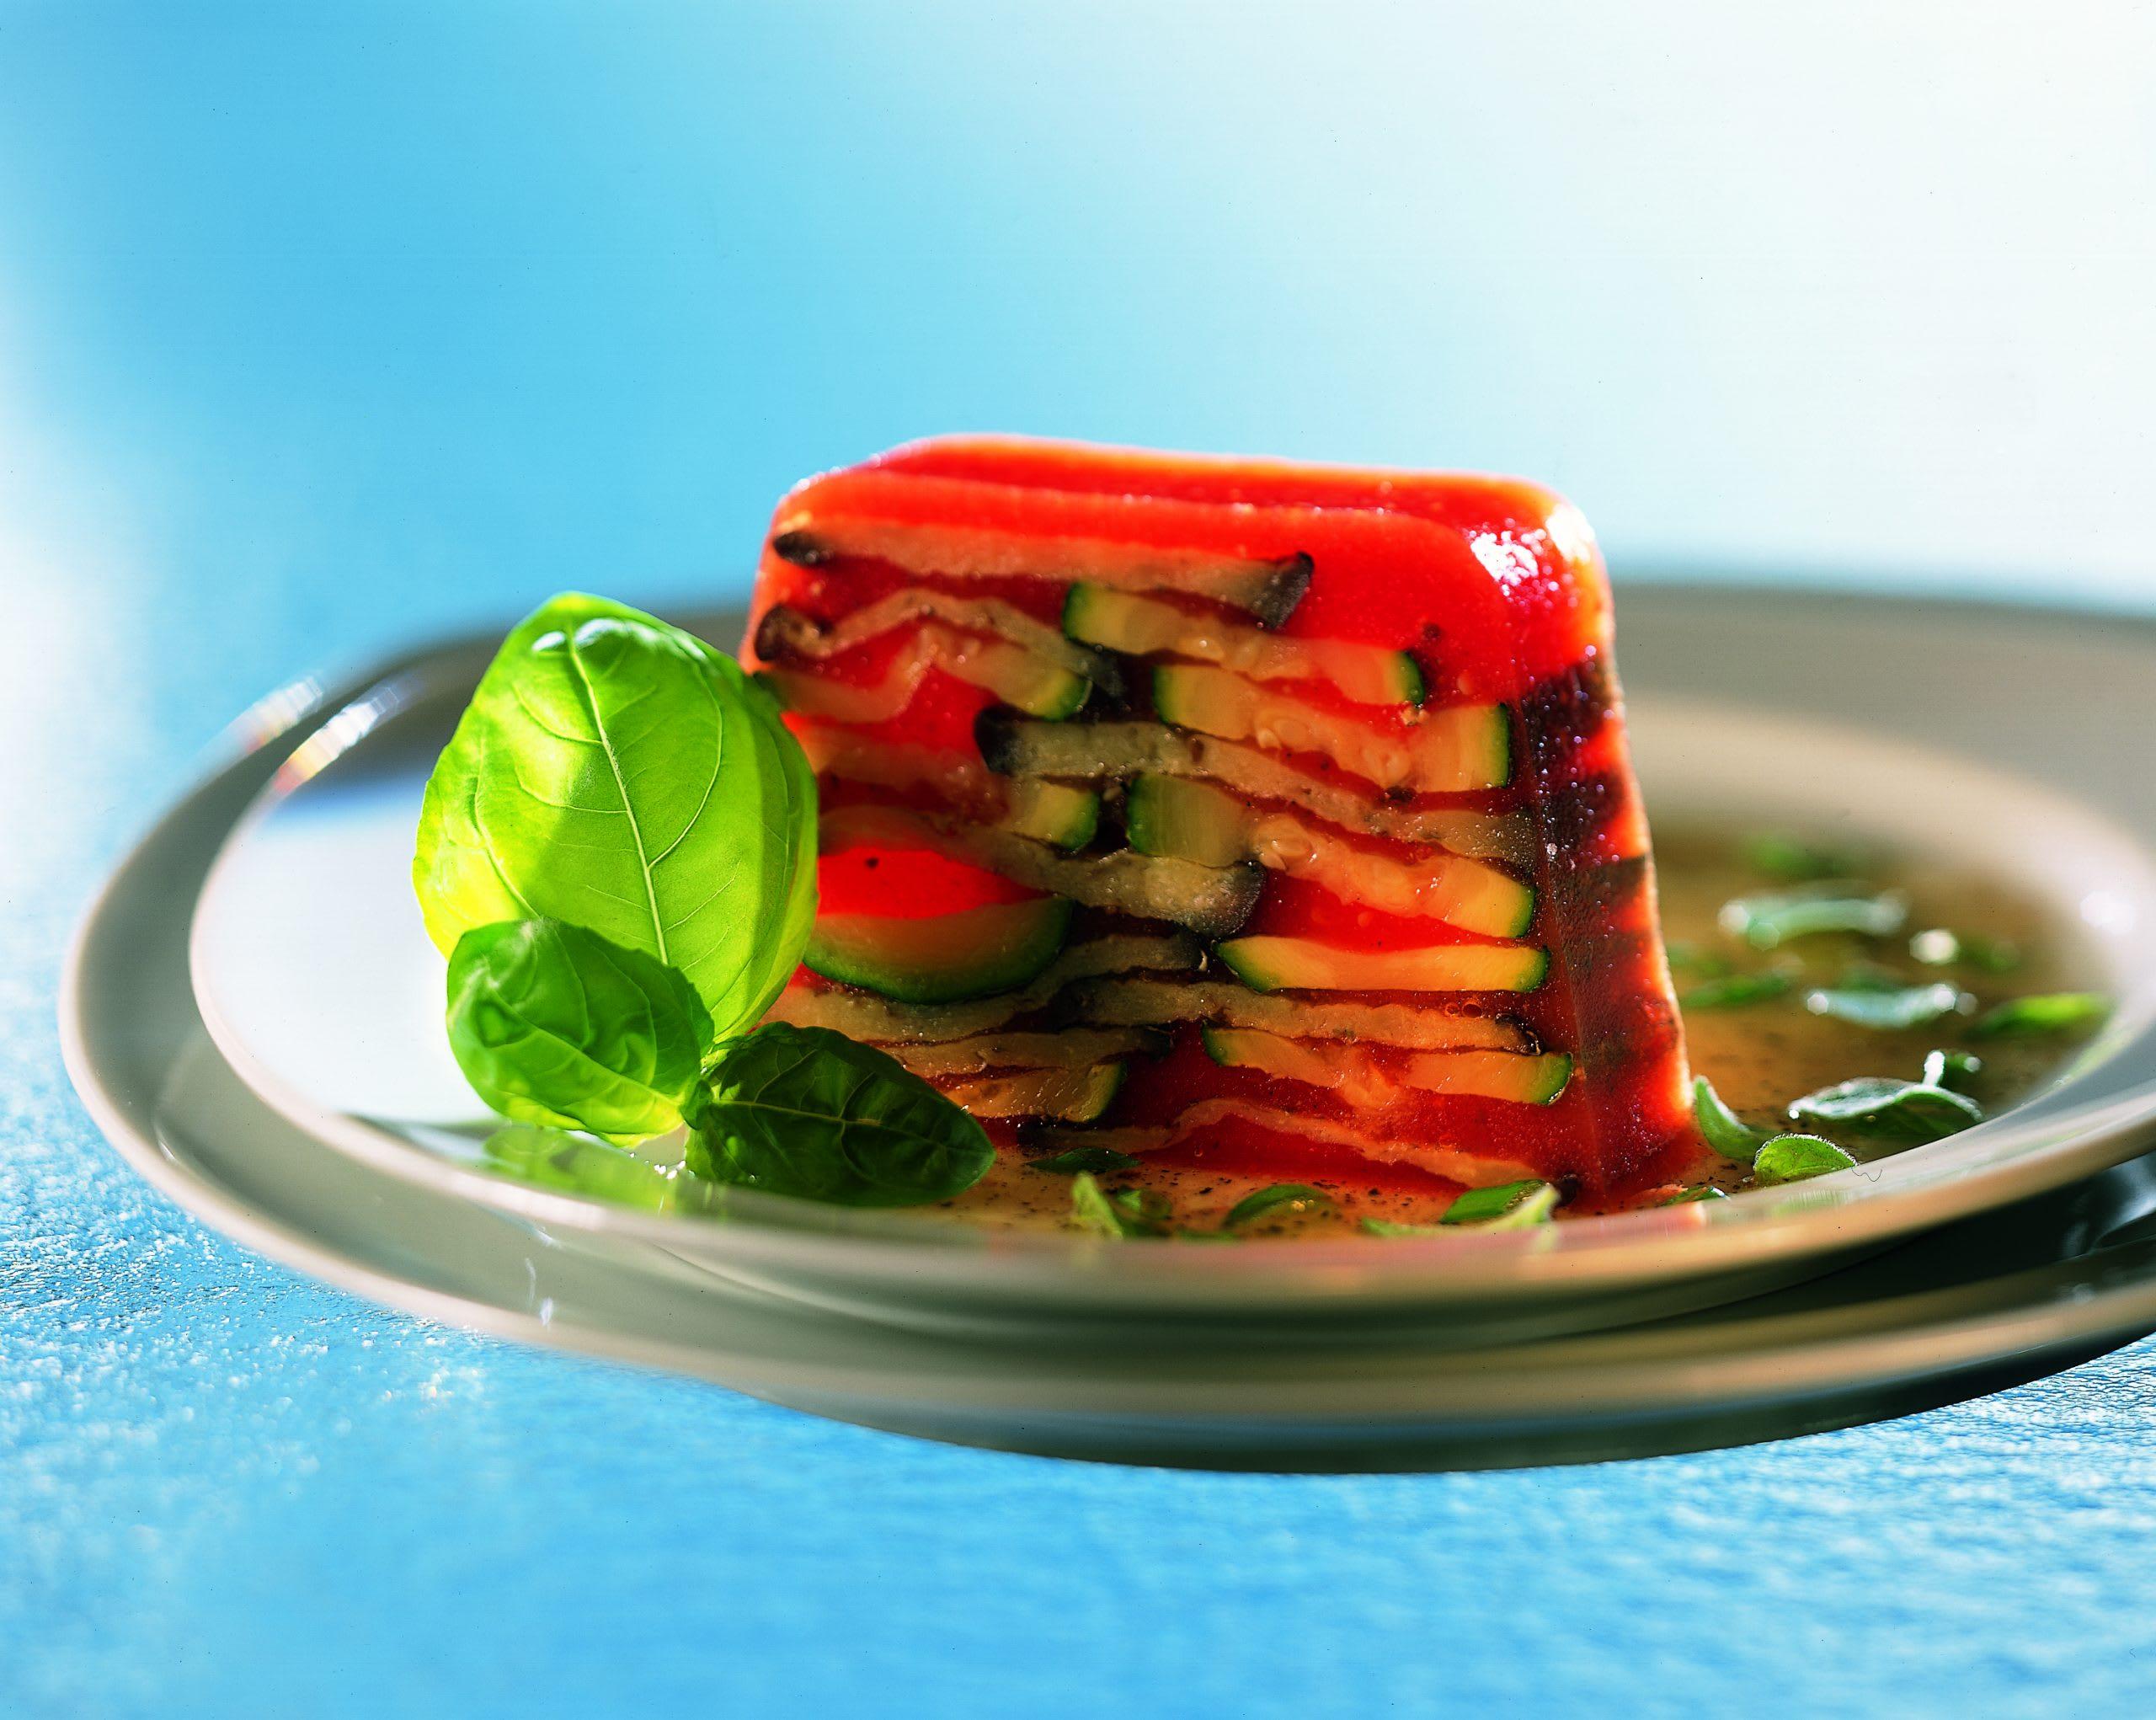 Gemüseterrine mit Kräuter-Vinaigrette